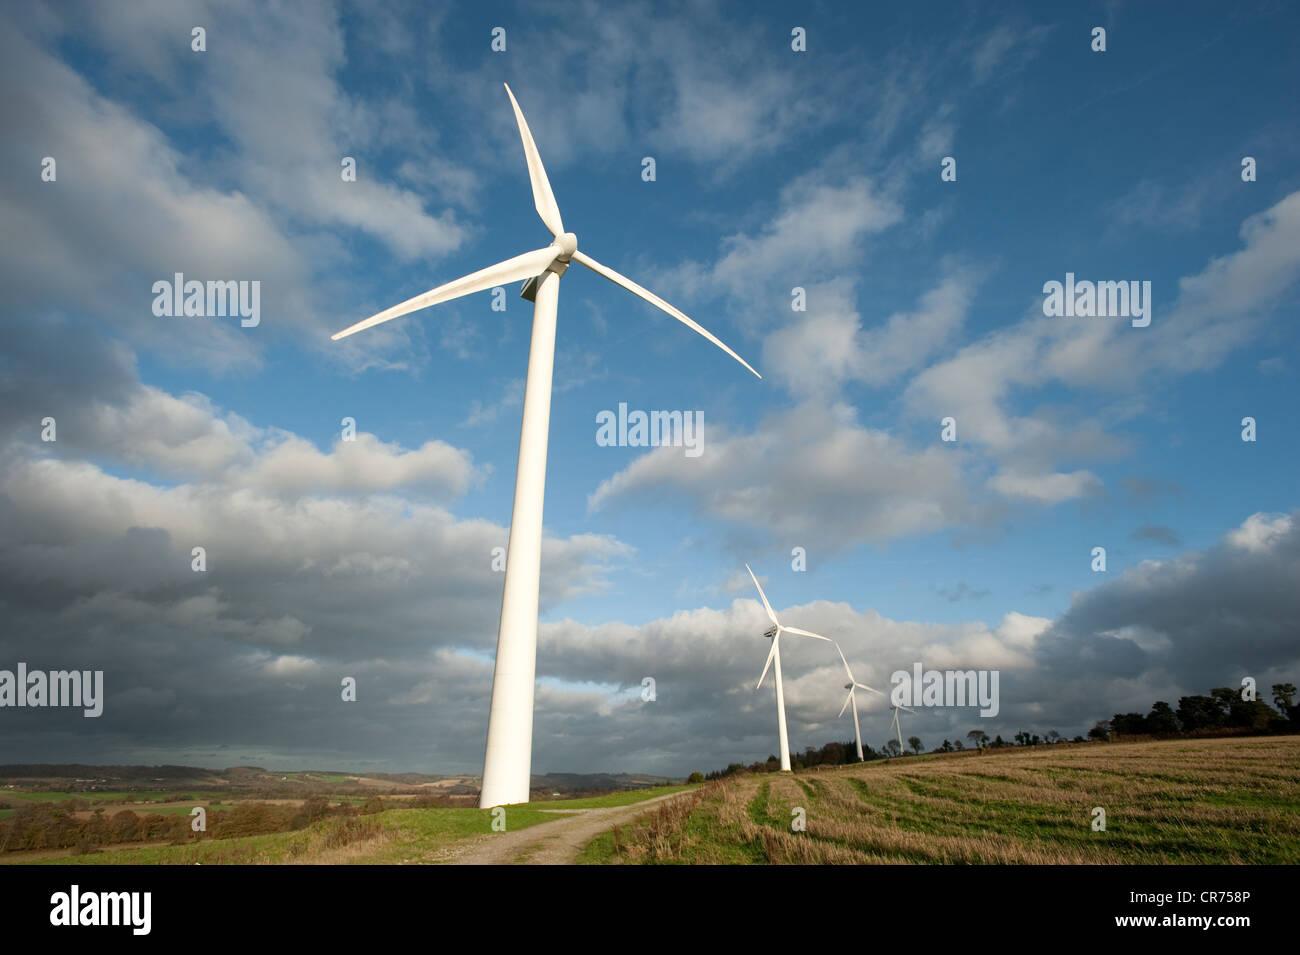 Francia, Cotes d'Armor, Caurel, parco eolico Immagini Stock